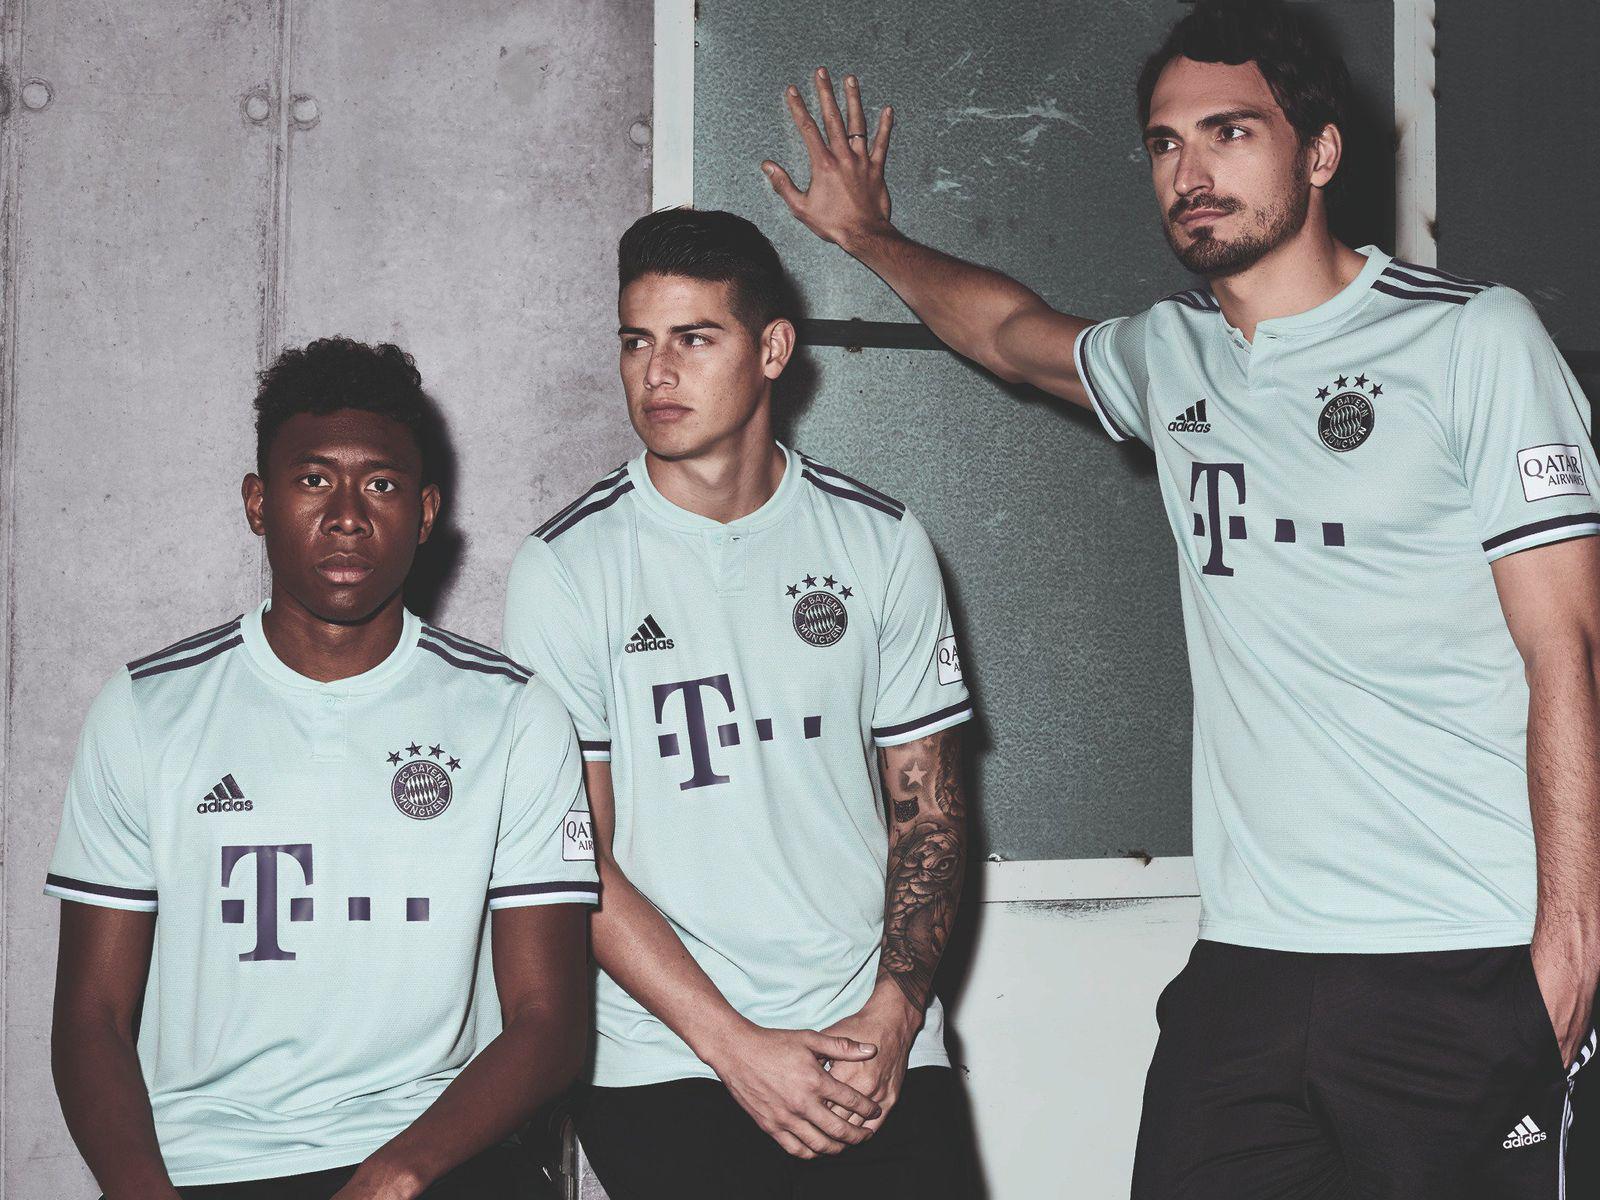 18 19 Bayern Munich Away Soccer Jersey Kit(Shirt+Short)